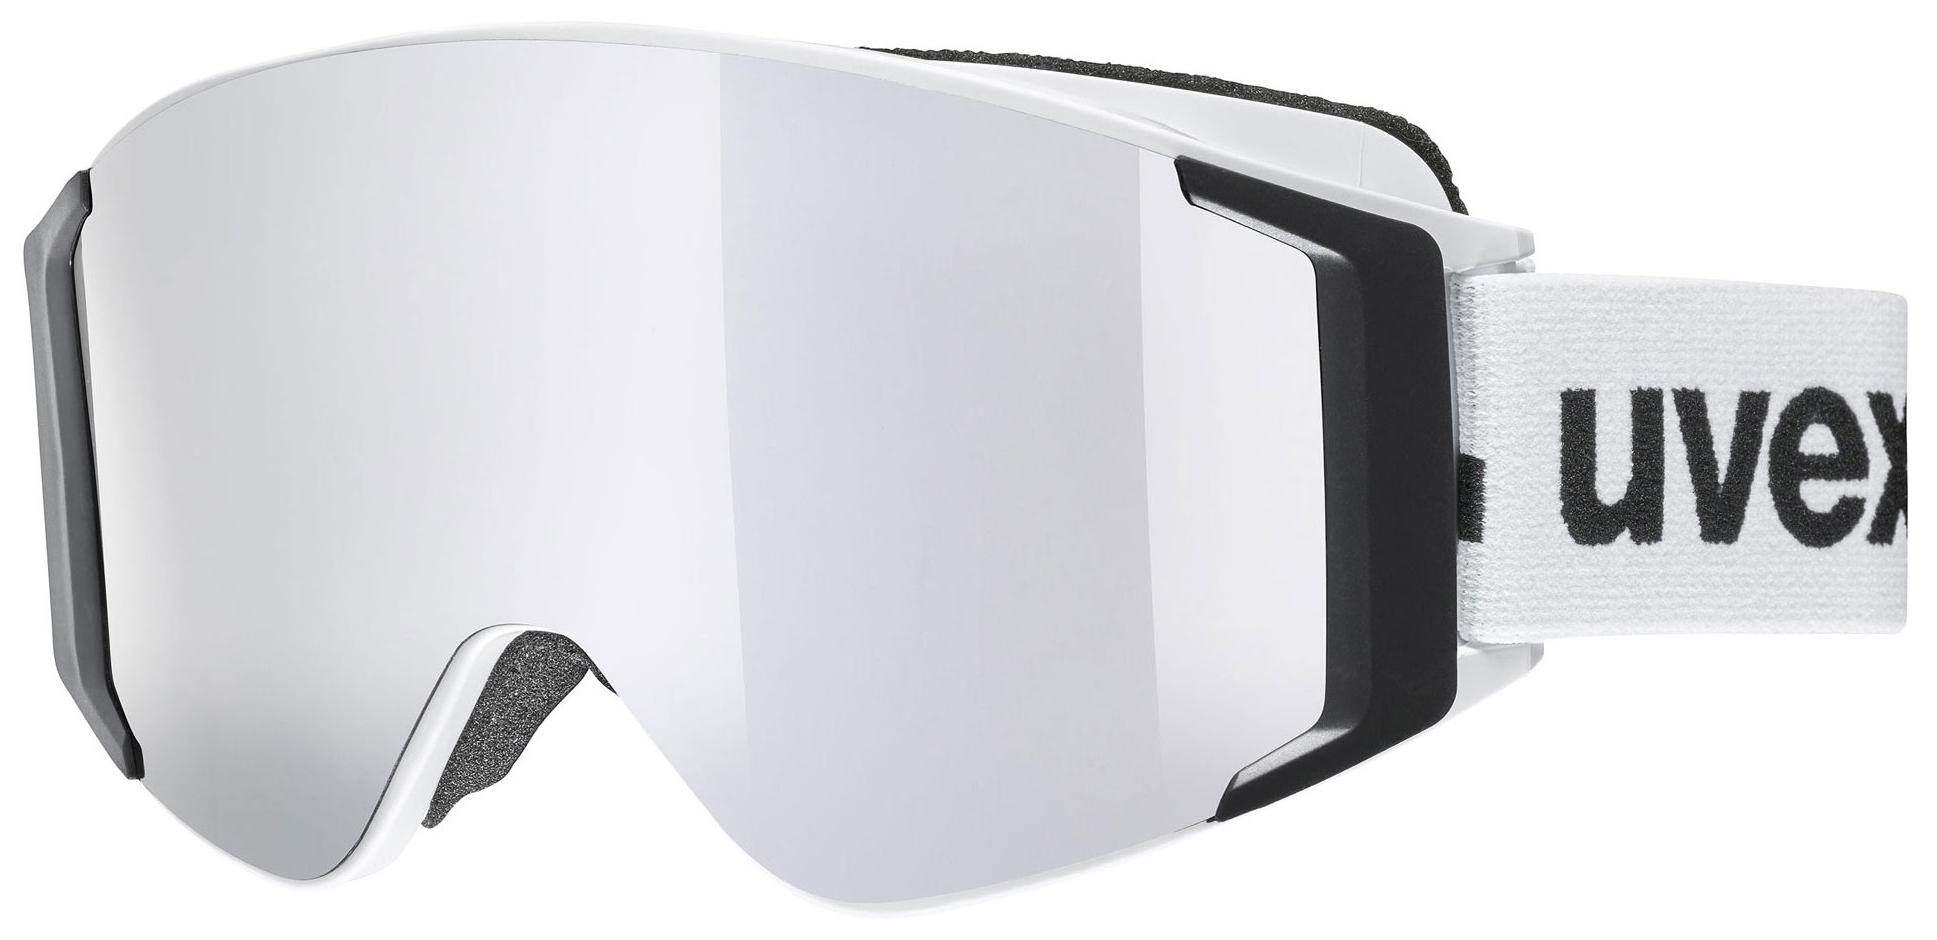 Uvex G.GL 3000 TOP White 1030